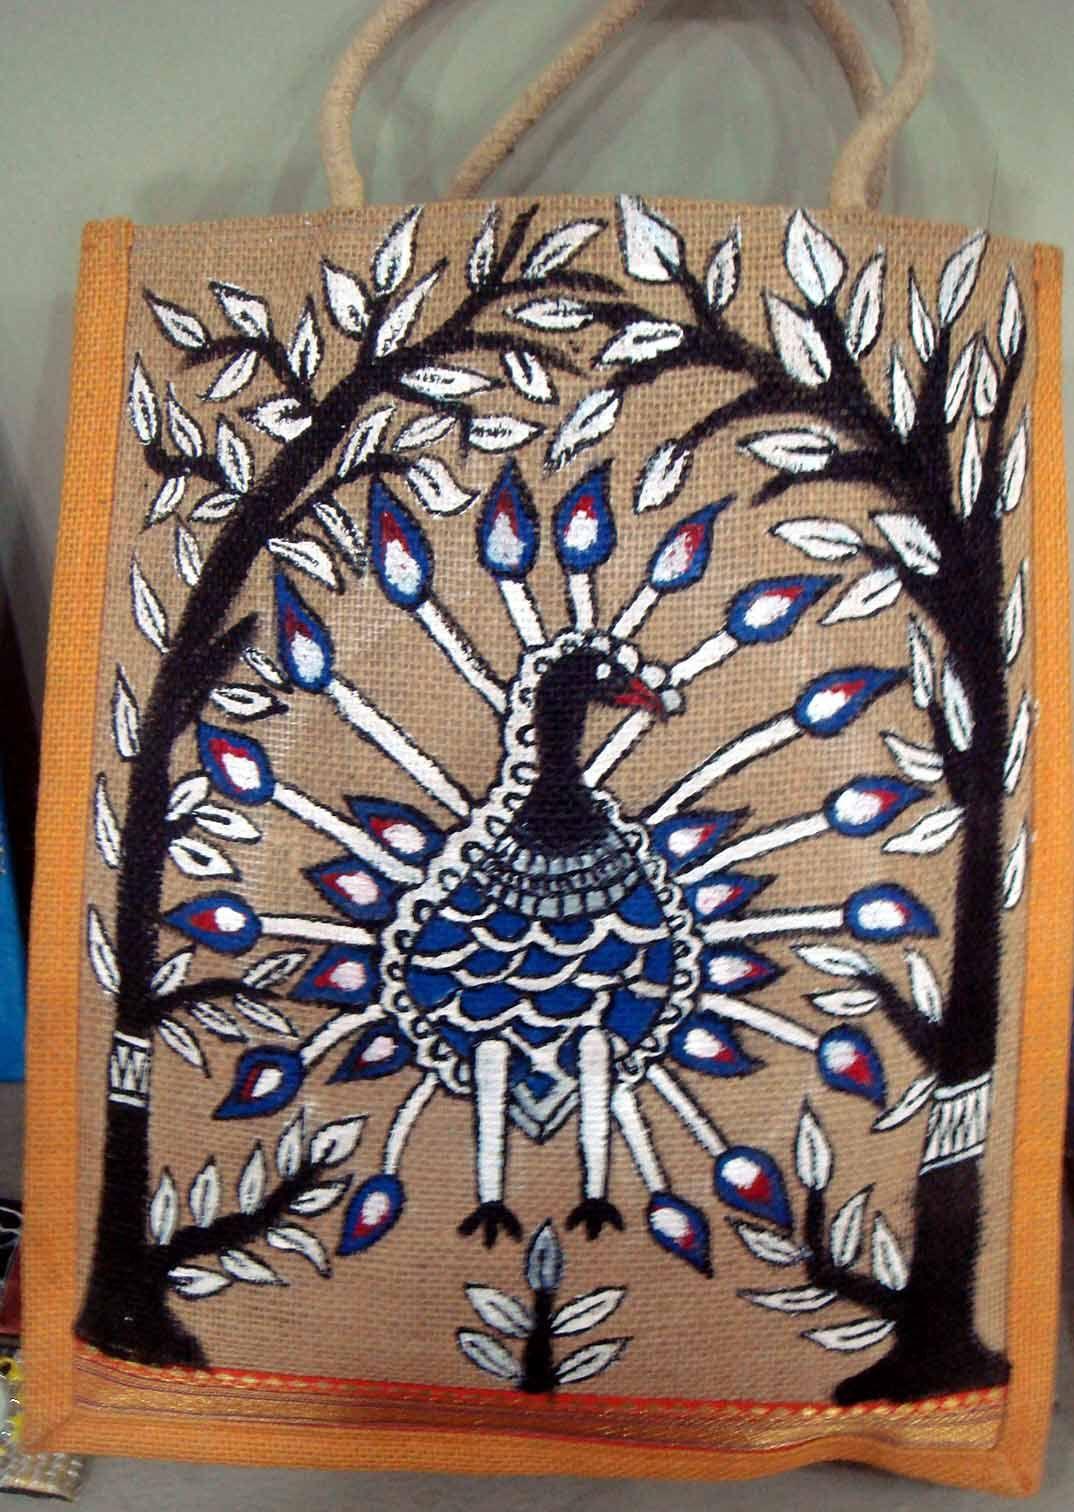 Gonda Art on Jute bag with acrylic colours